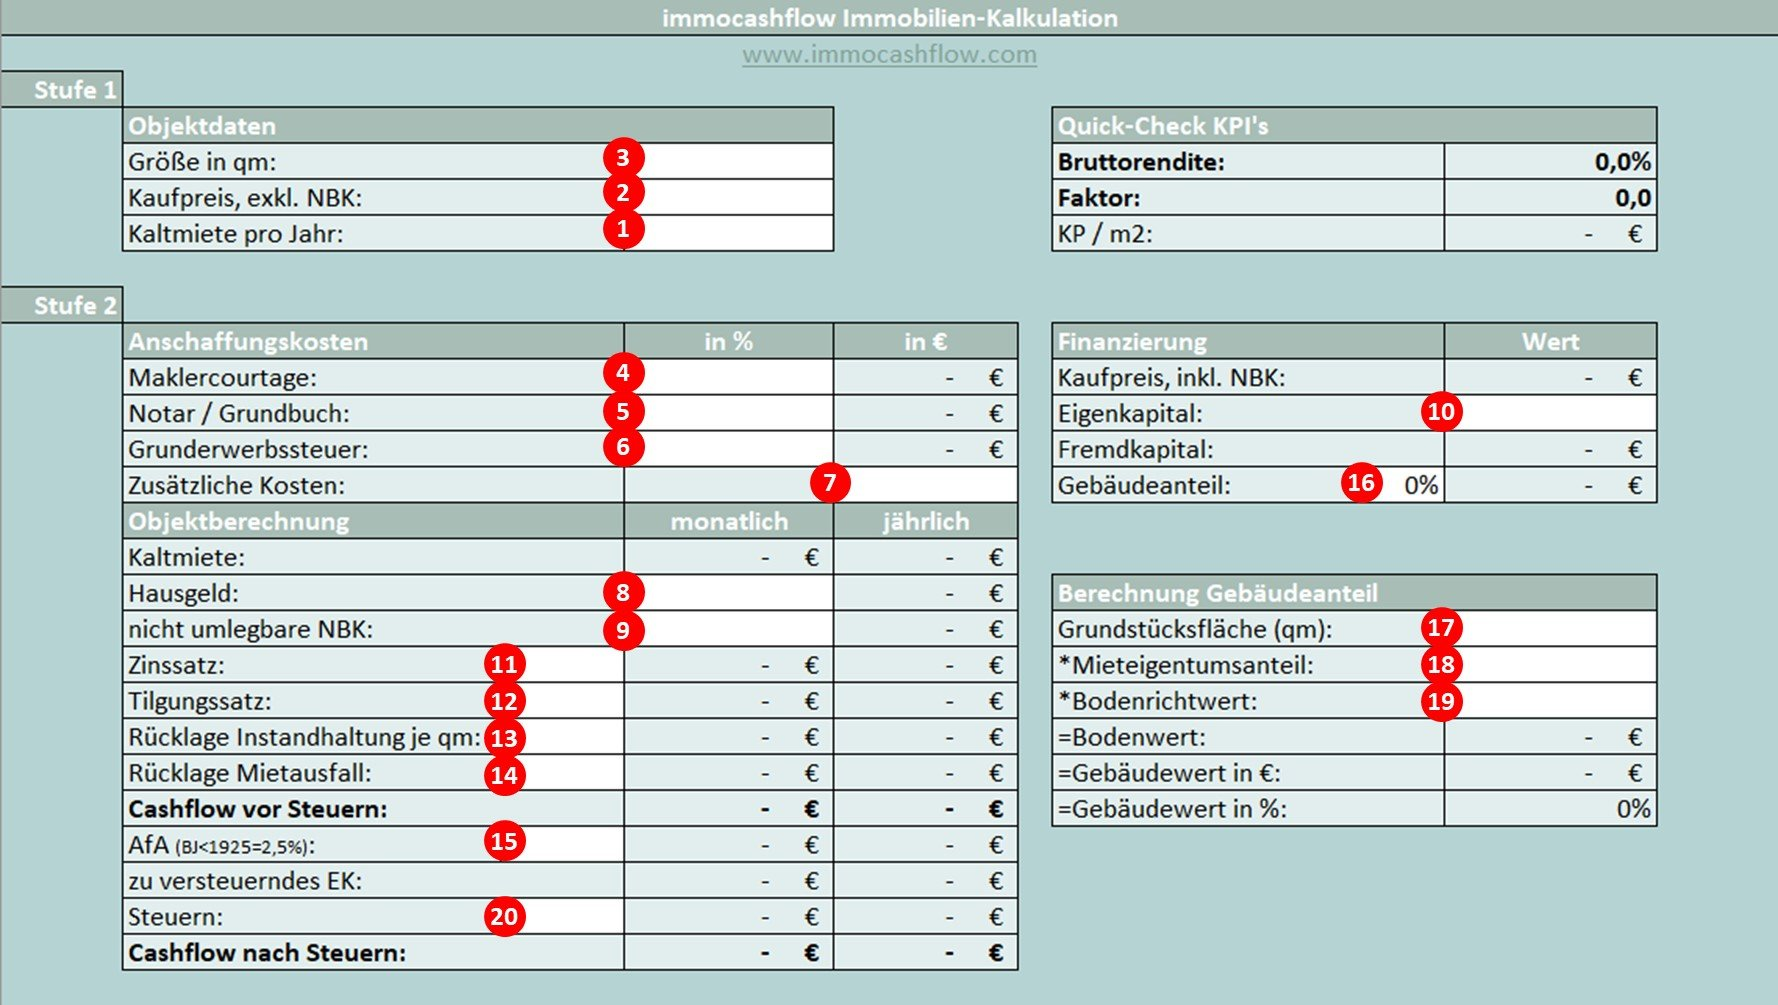 Immobilien Kalkulationstool - Übersicht